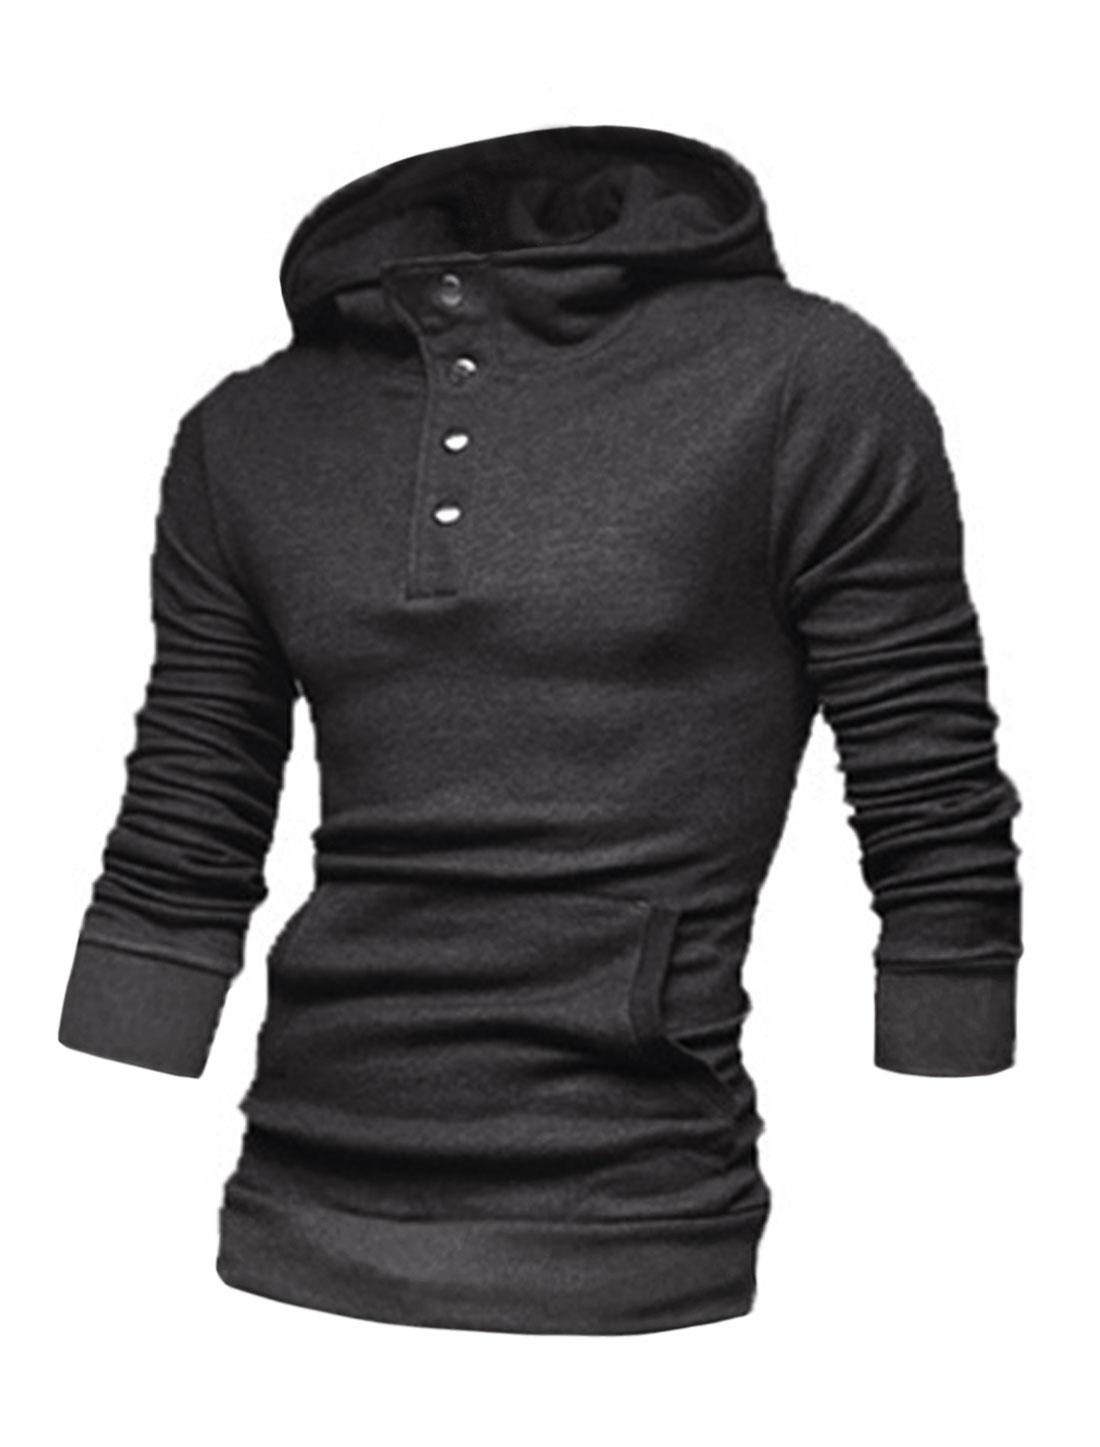 Men Long Sleeve Kangaroo Pocket Button Closure Upper Casual Hoodies Dark Gray M